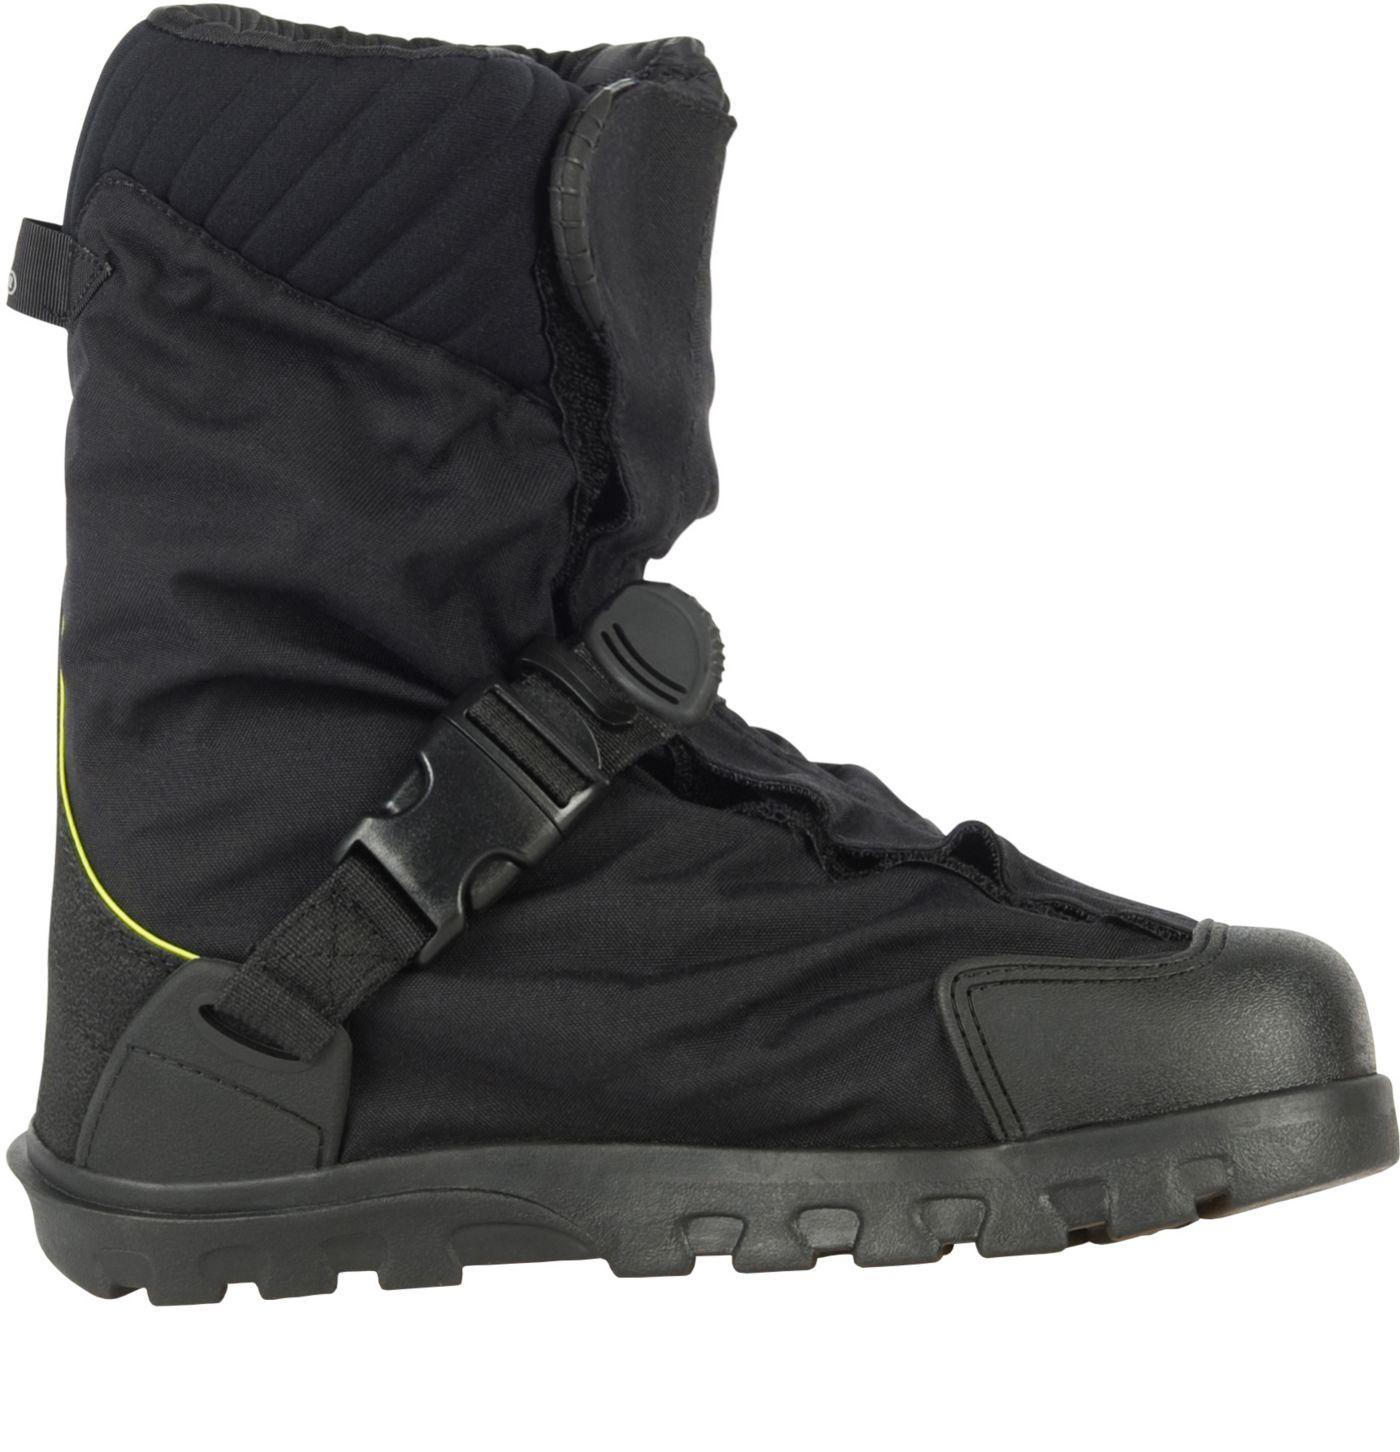 NEOS Adult Explorer Insulated Waterproof Overshoes